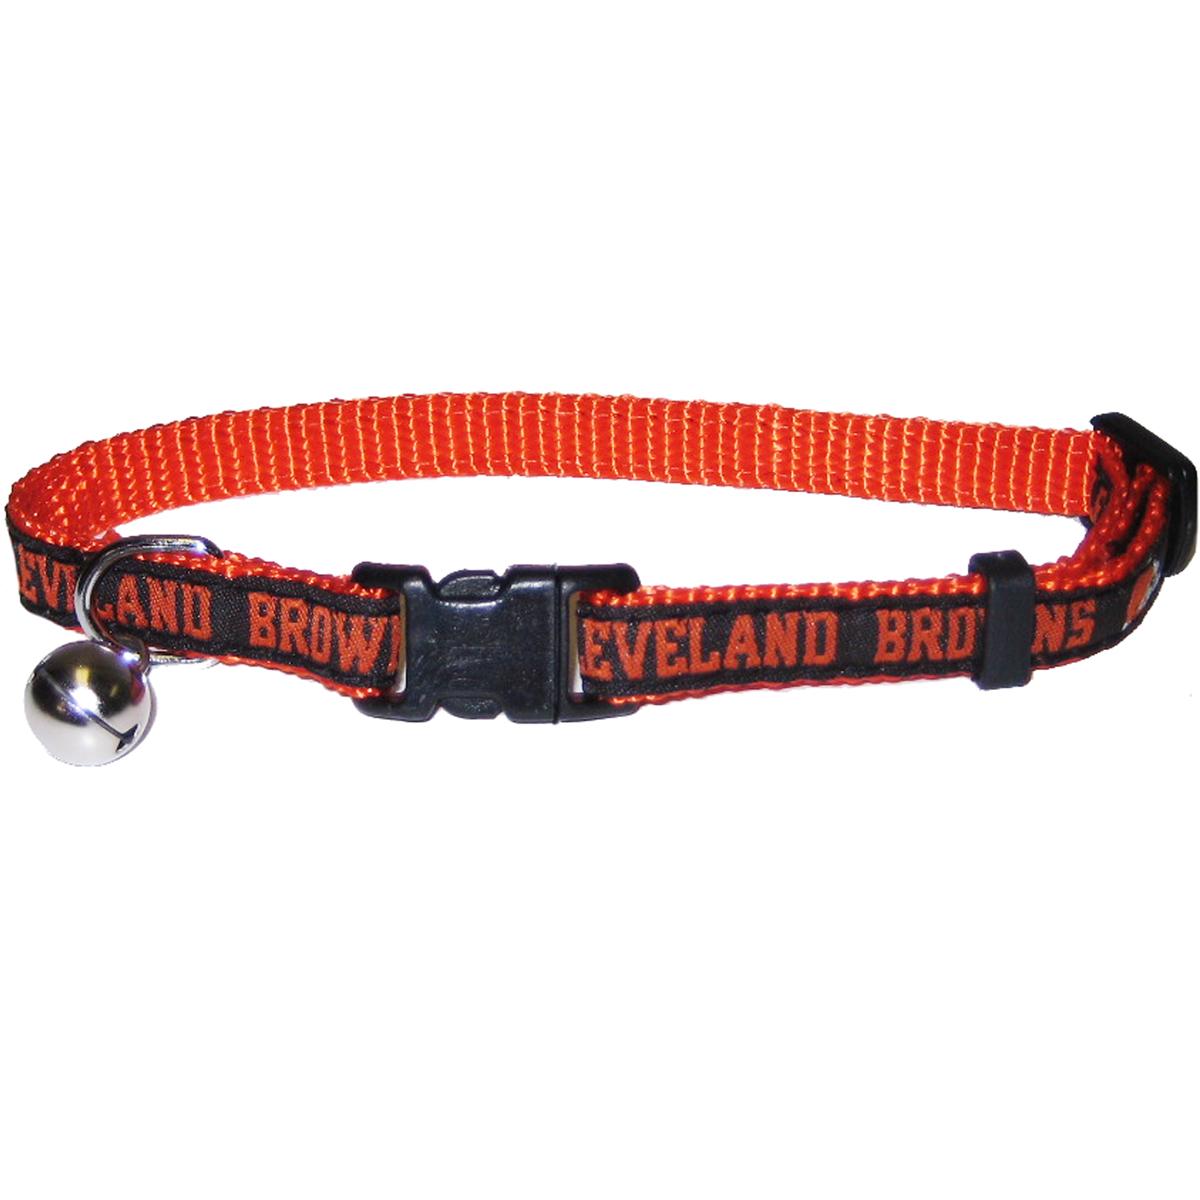 Hot Dog Cleveland Browns CAT Collar